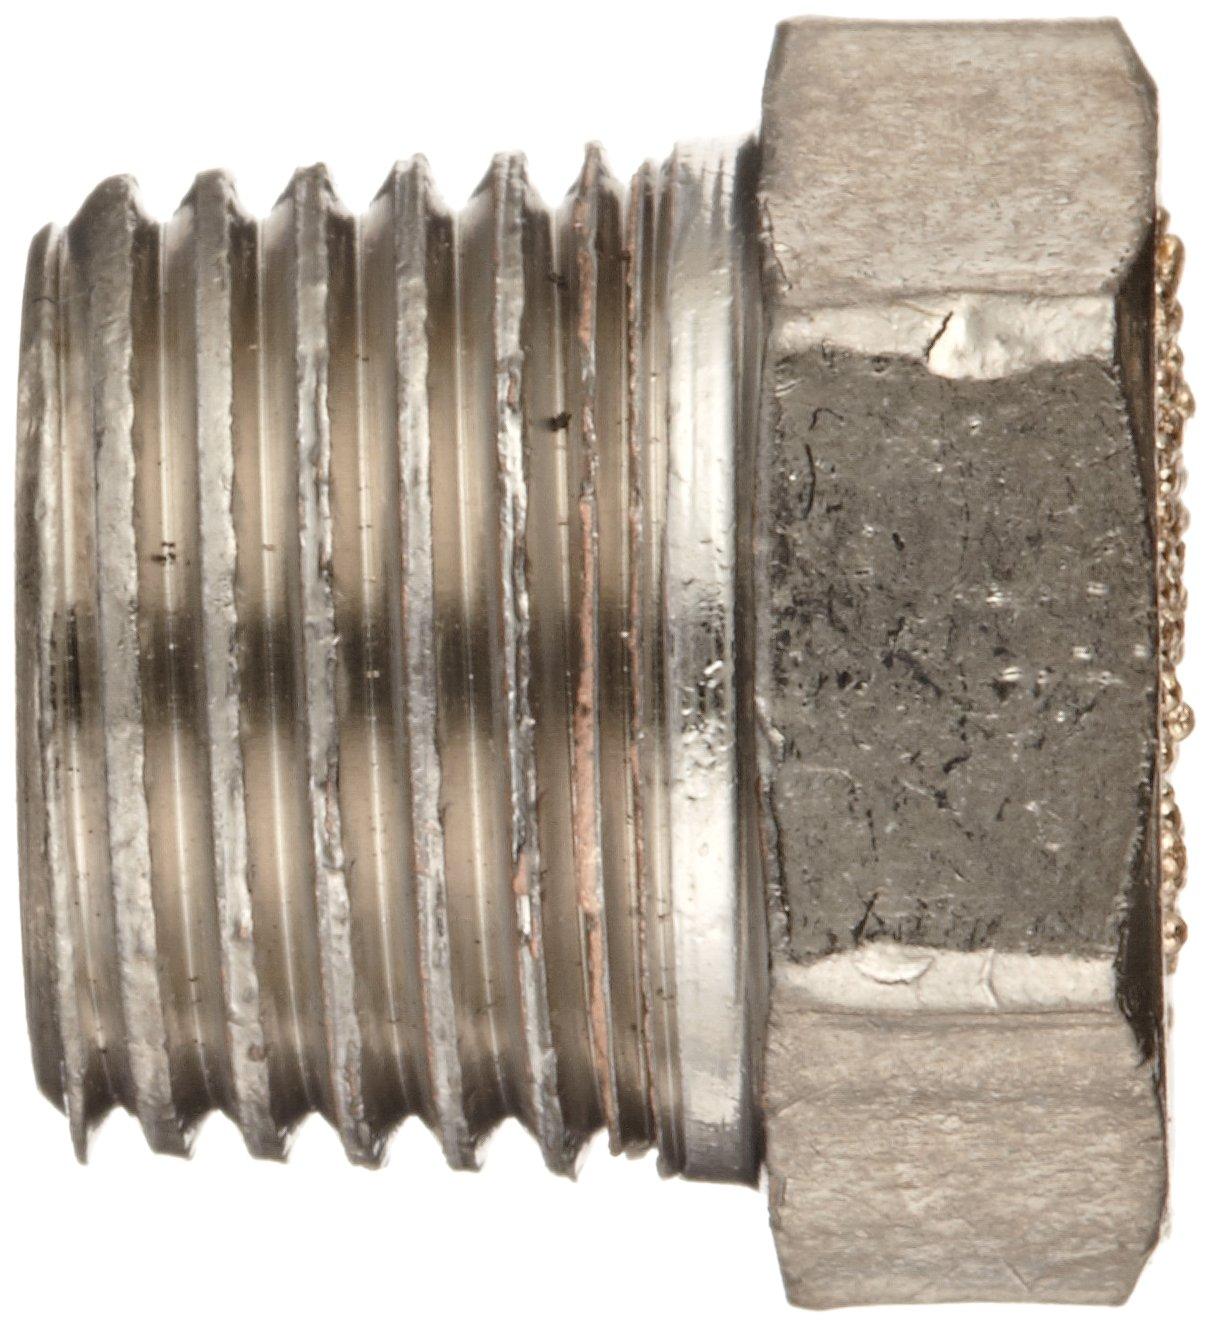 7/8 Length 1/2 NPT Male Dixon ASP-4BV Nickel Plated Steel Air Hose ...